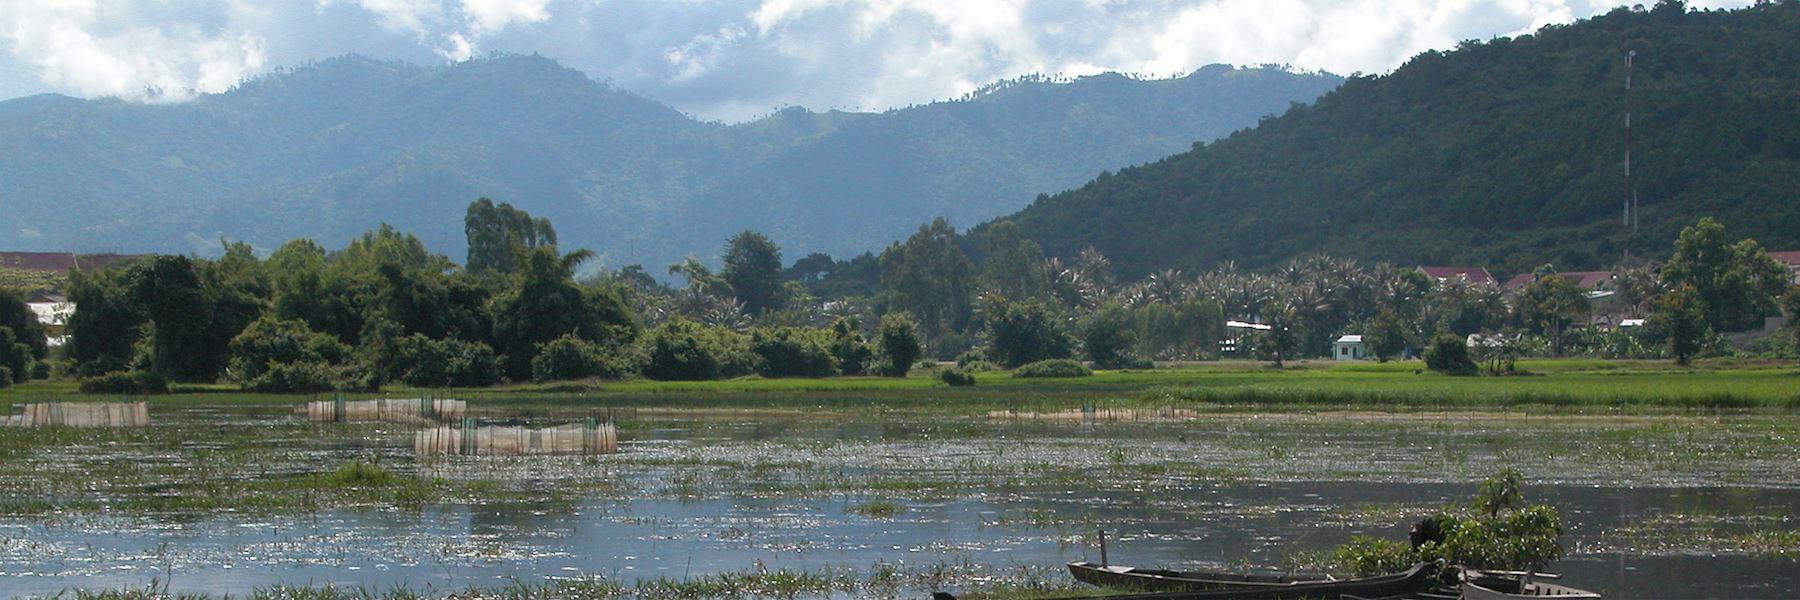 Visit Buon Ma Thuot, Vietnam